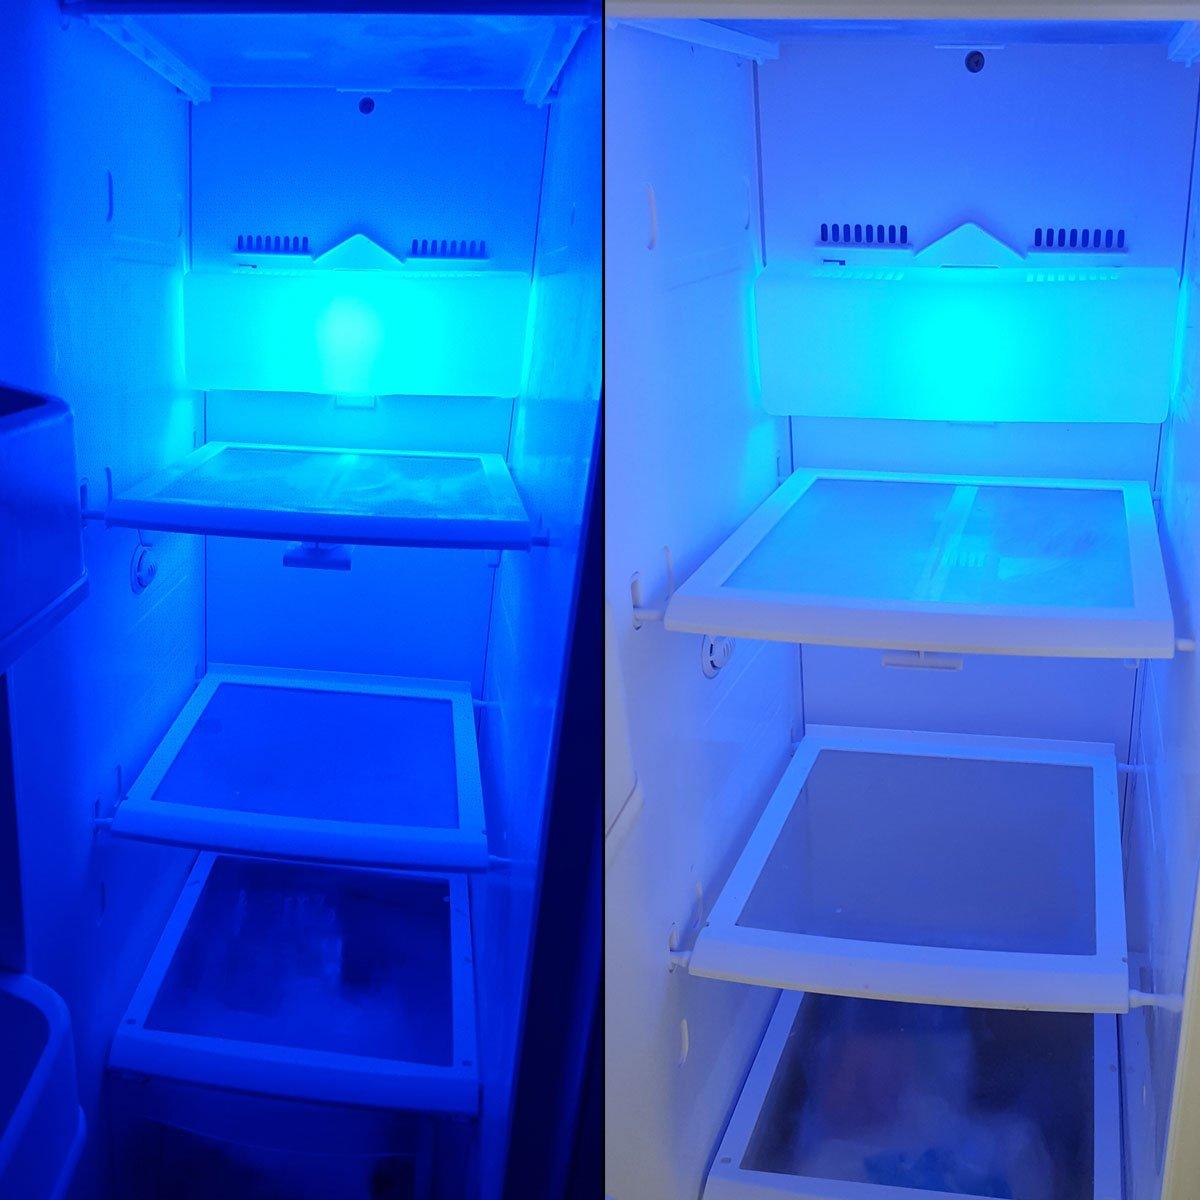 2x stk e14 led lampe 15 watt blau blaulicht fr den 2x stk e14 led lampe 15 watt blau blaulicht fr den khlschrnke lampen uvm e14ses leuchtmittel khlschrank birne glhbirne ersatz amazon parisarafo Images